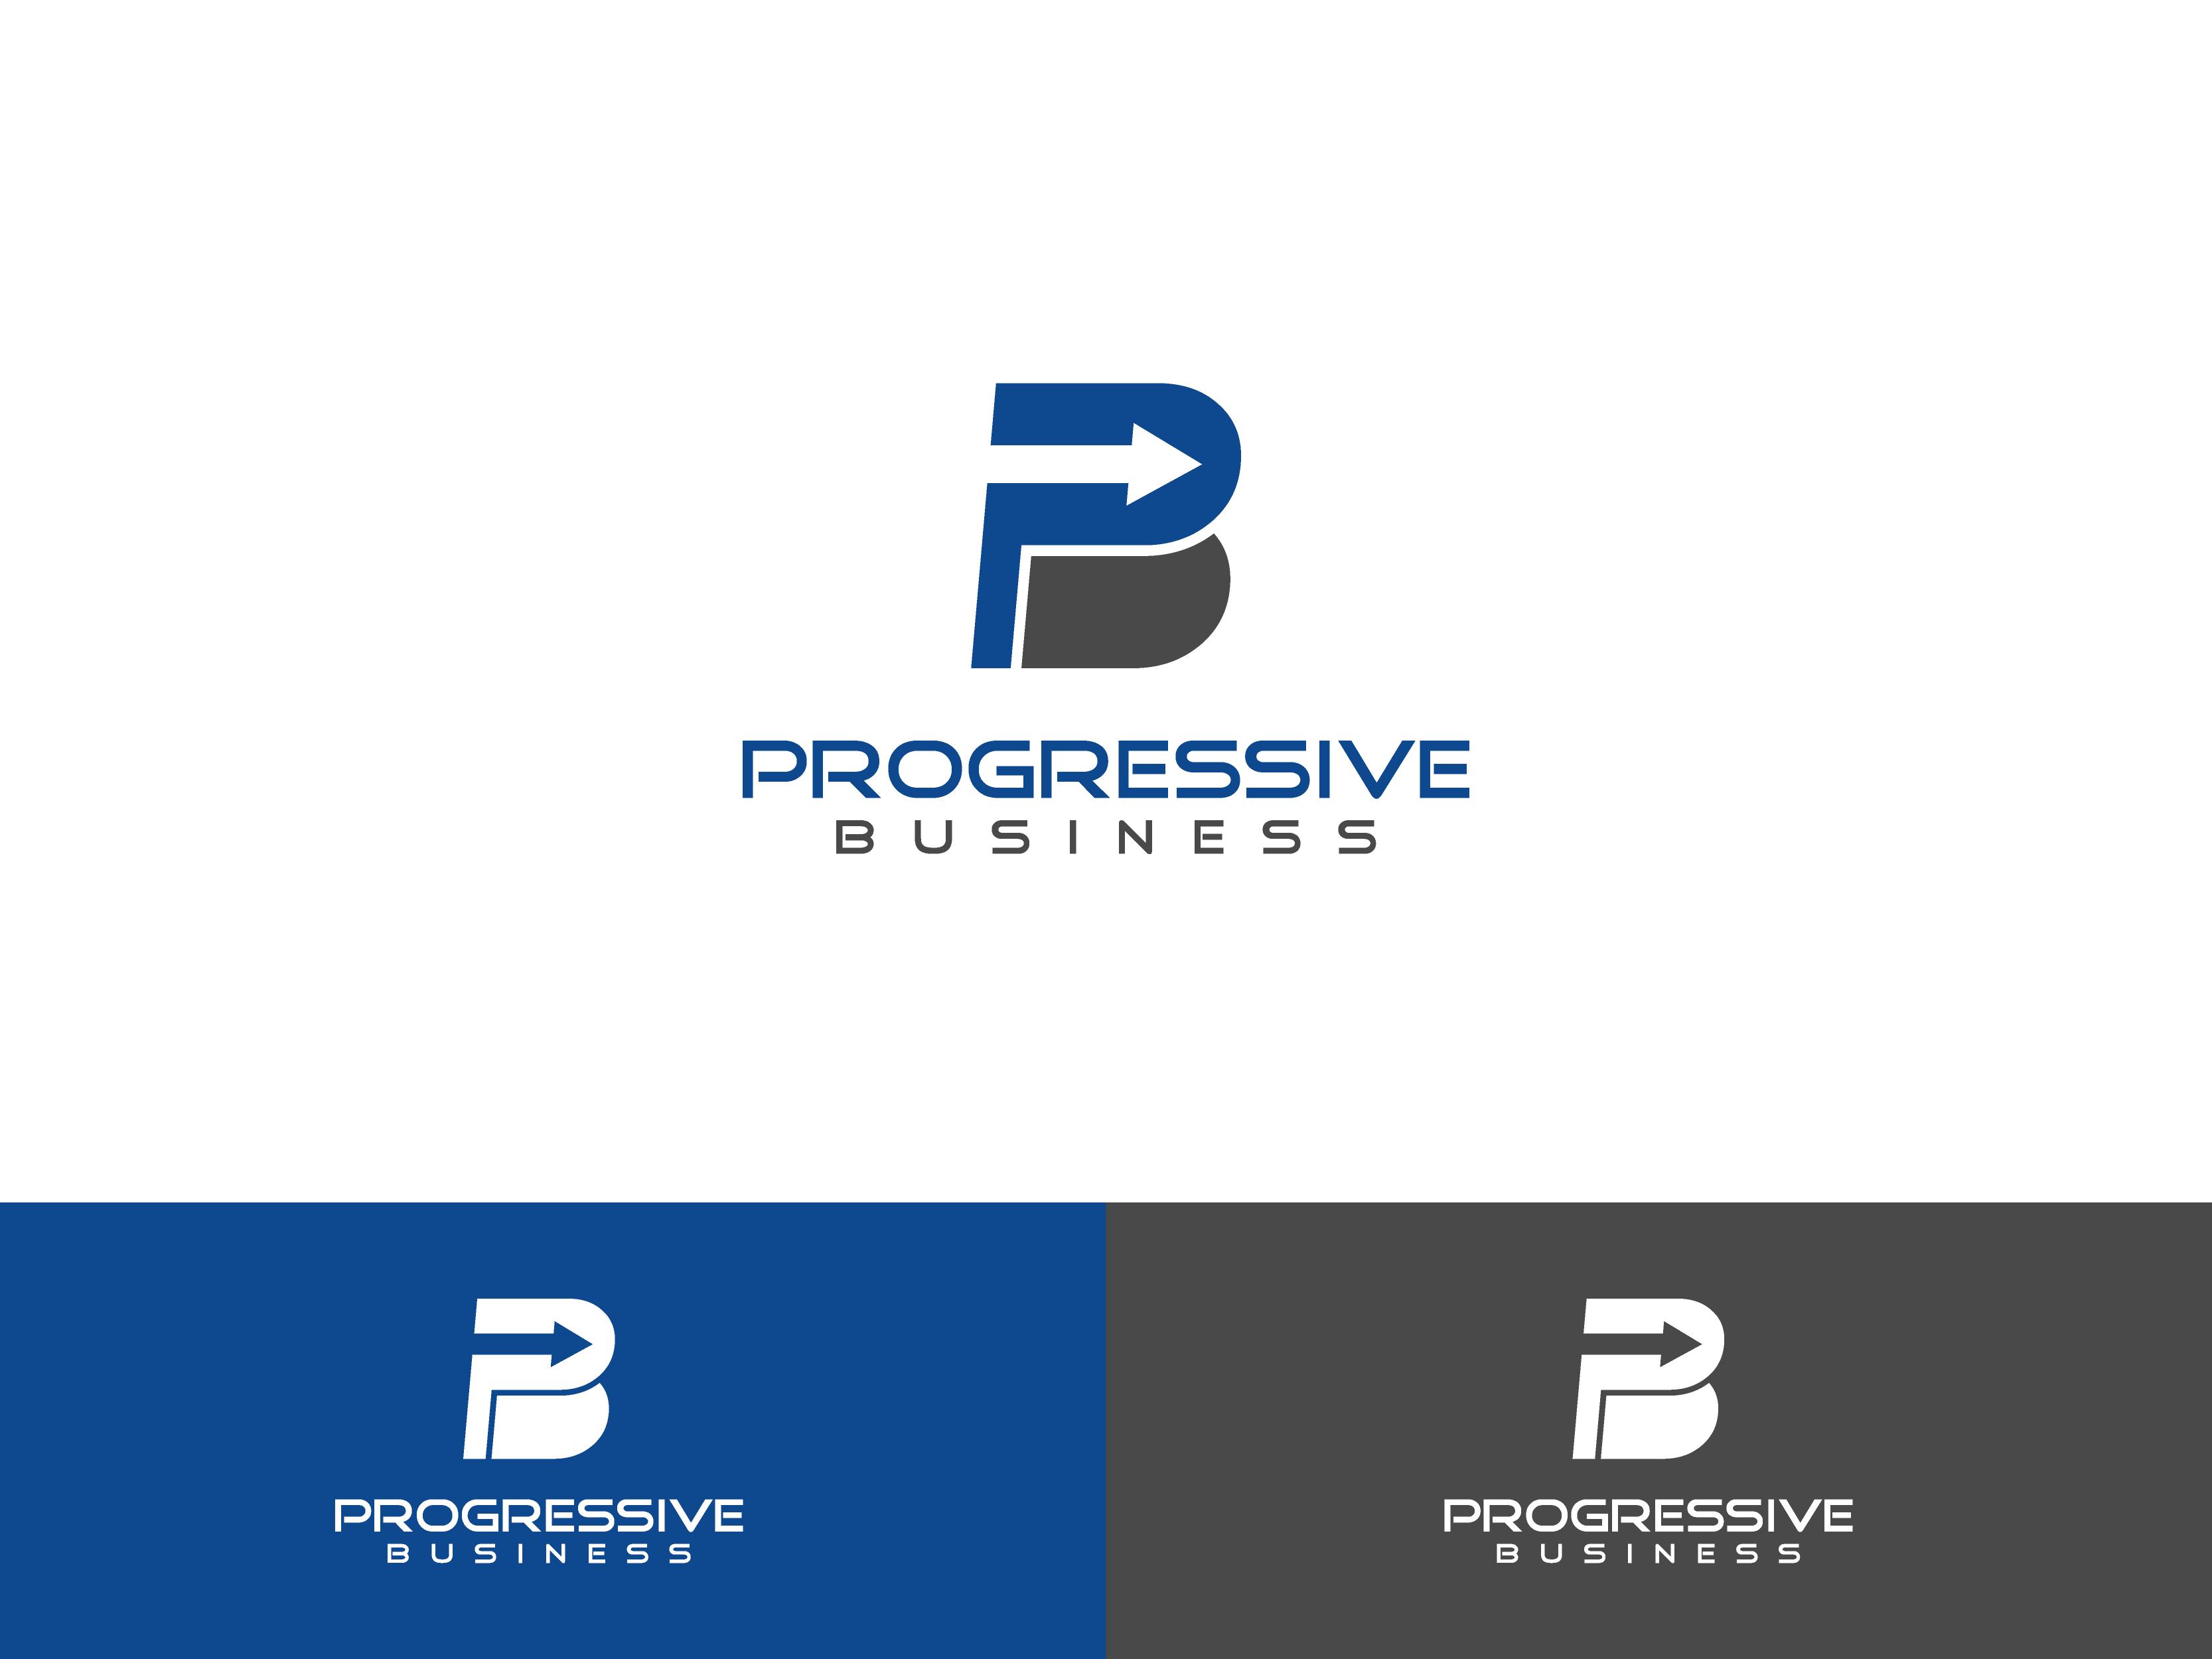 Logo Design by Shivaprasad Sangondimath - Entry No. 27 in the Logo Design Contest Captivating Logo Design for Progressive Business.